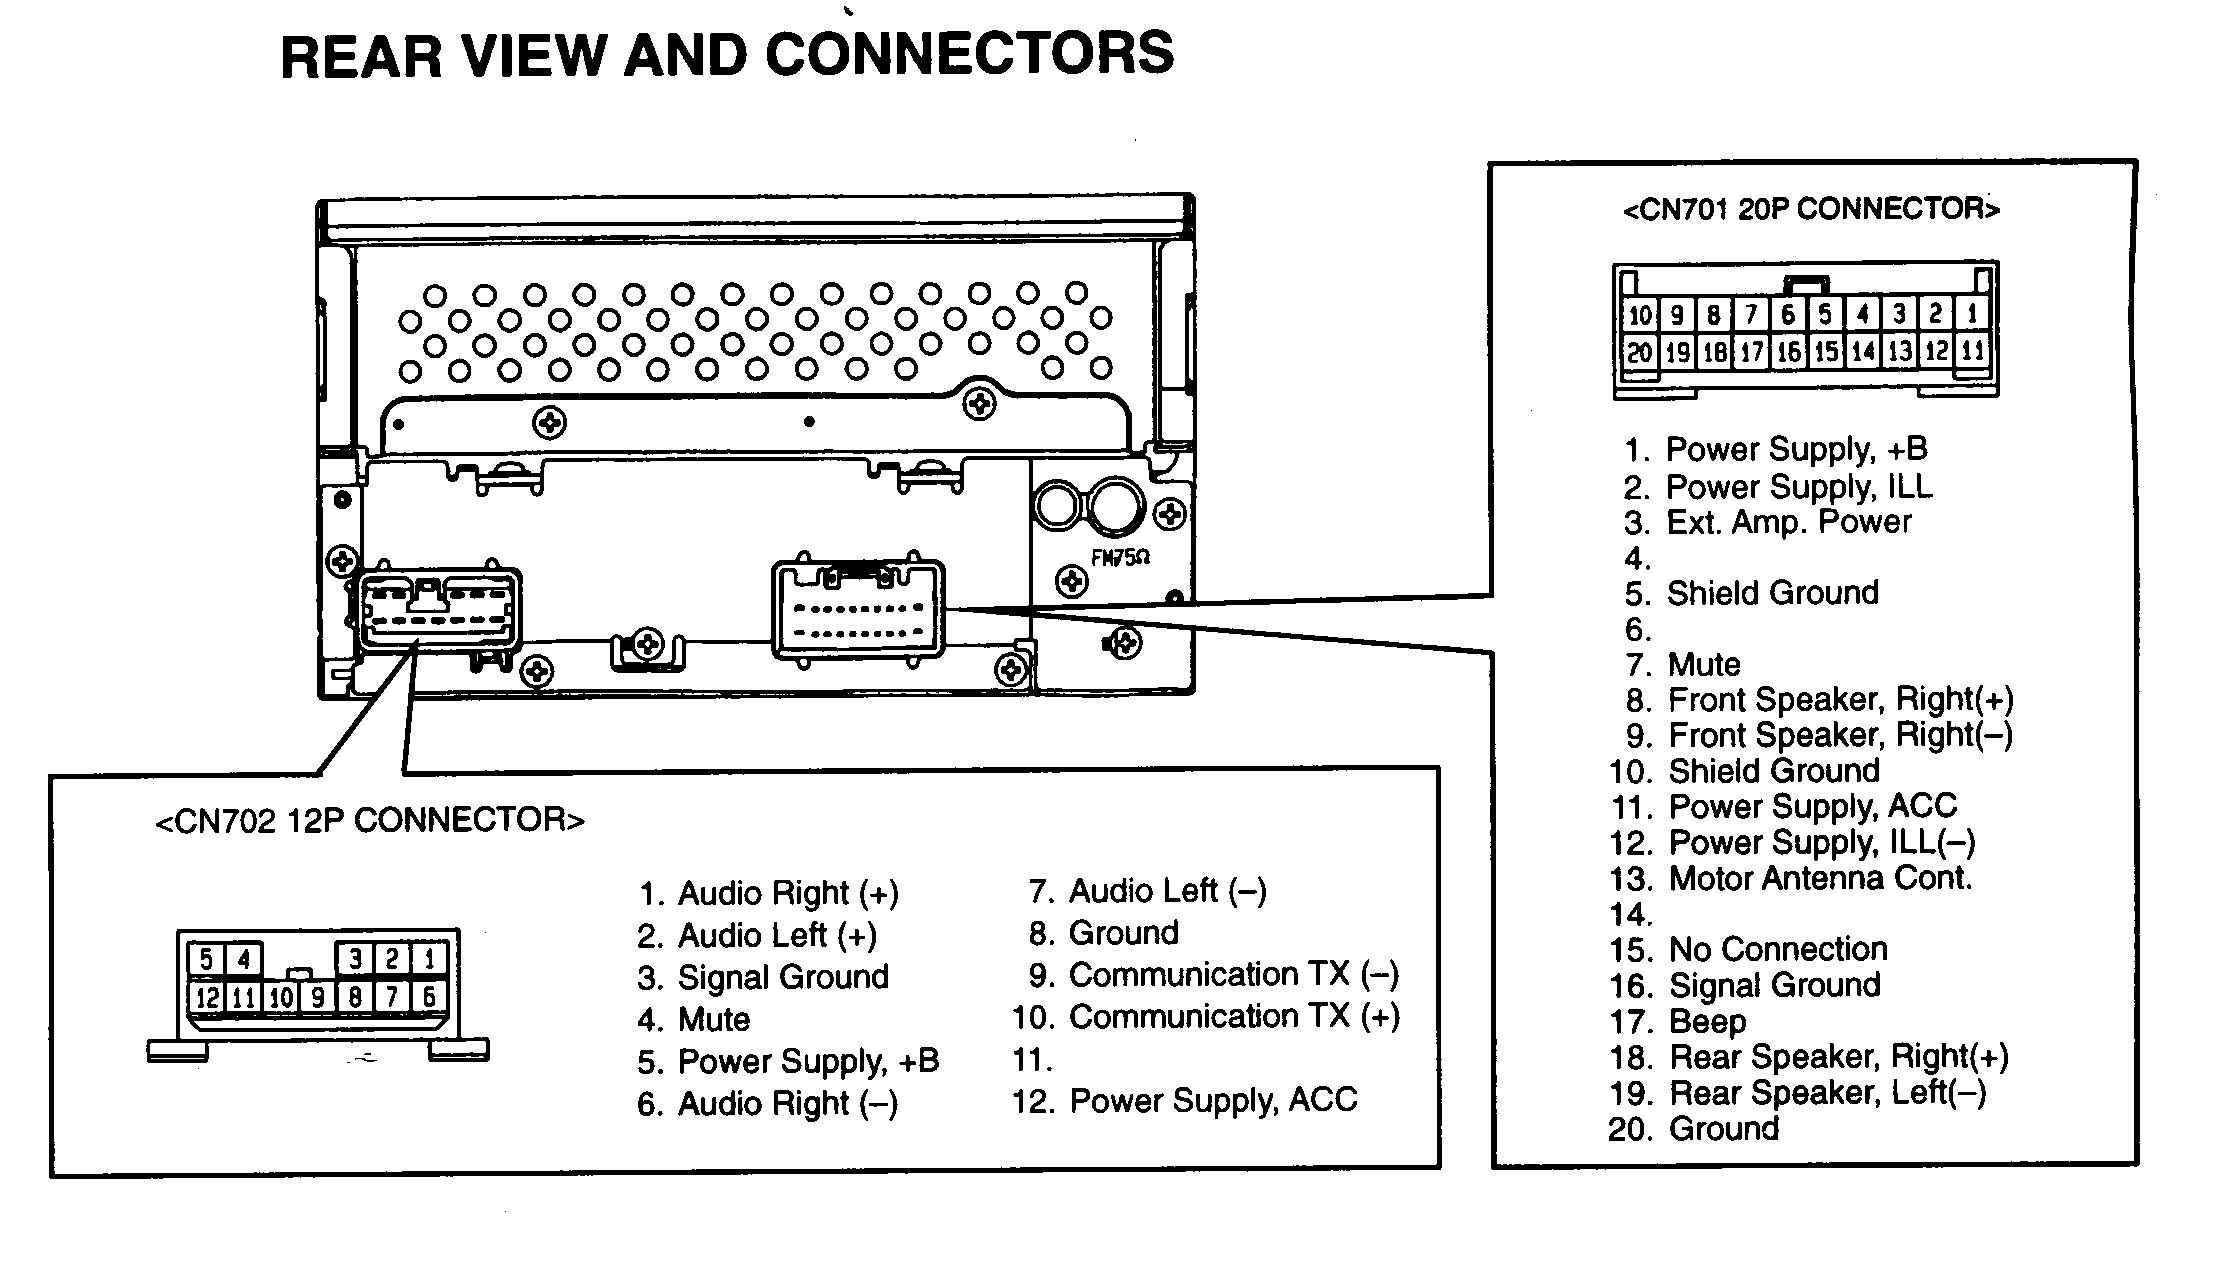 Hyundai car stereo wiring diagram my wiring diagram with factory car stereo wiring diagrams asfbconference2016 Images